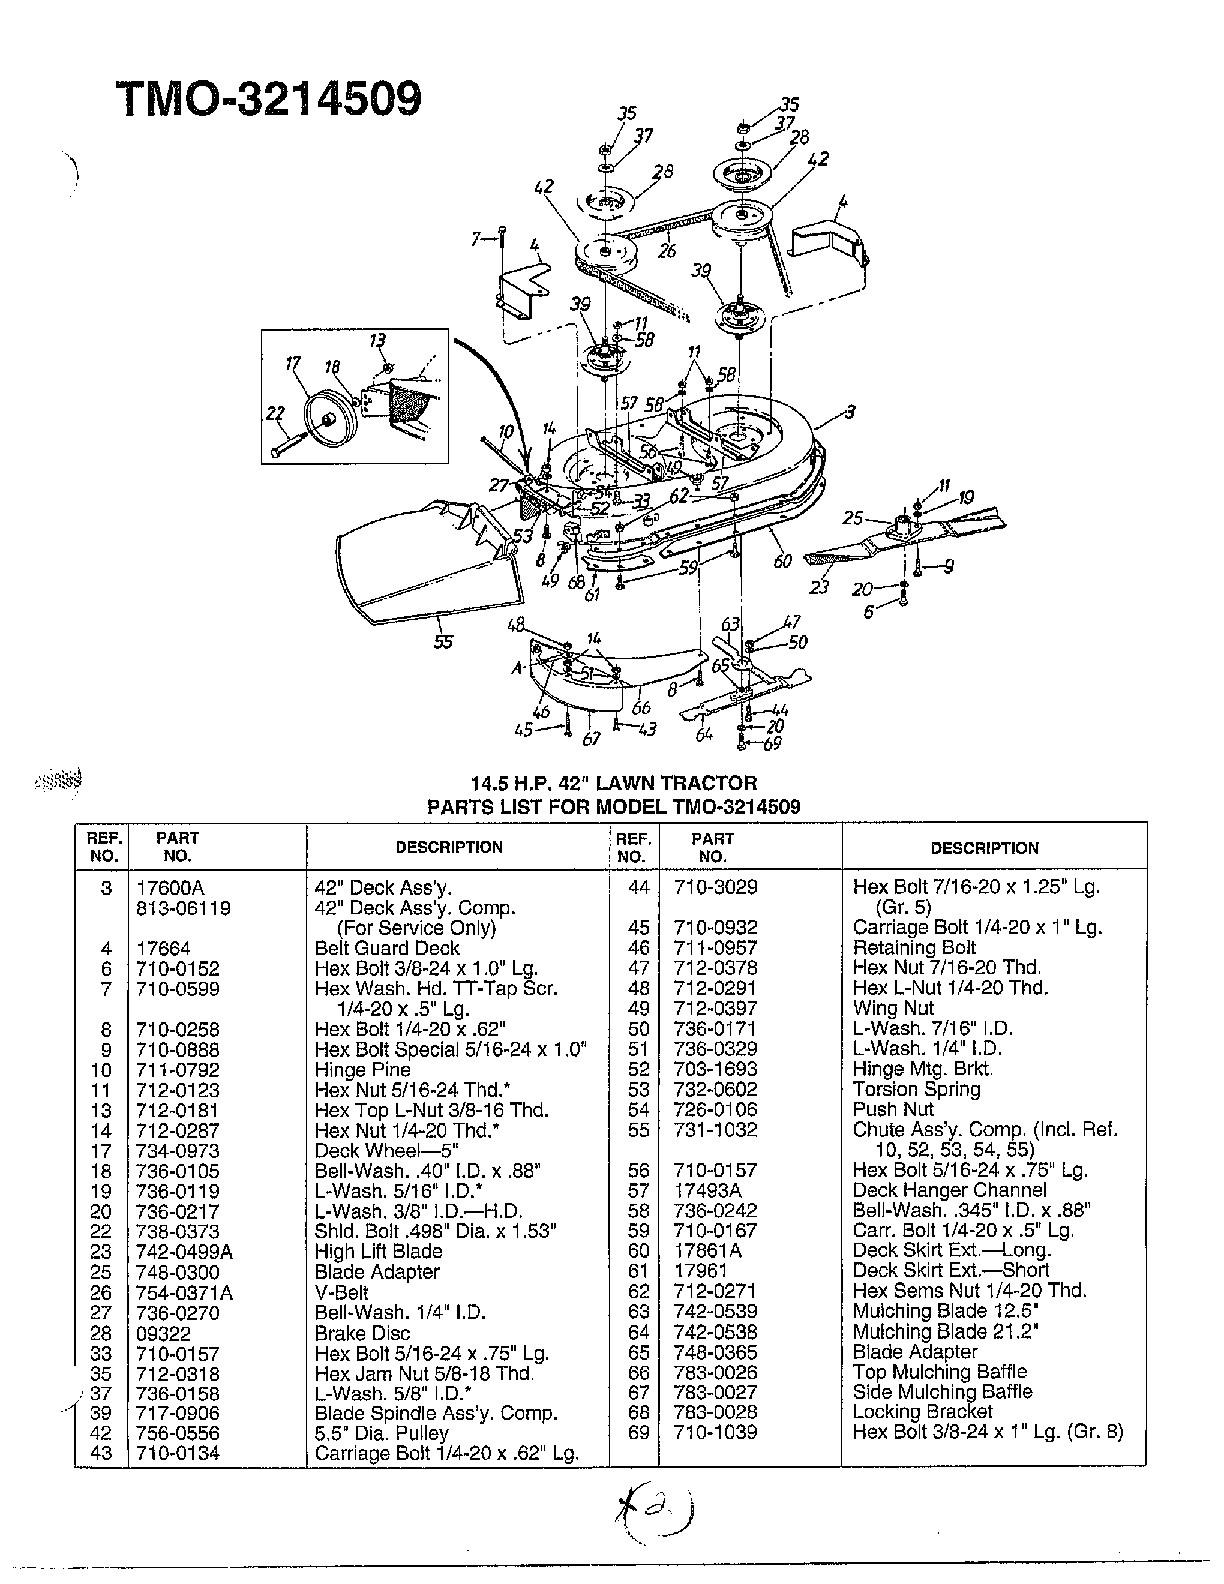 Craftsman Lawn Mower Engine Parts Diagram Mtd Model Lawn Tractor Genuine Parts Of Craftsman Lawn Mower Engine Parts Diagram